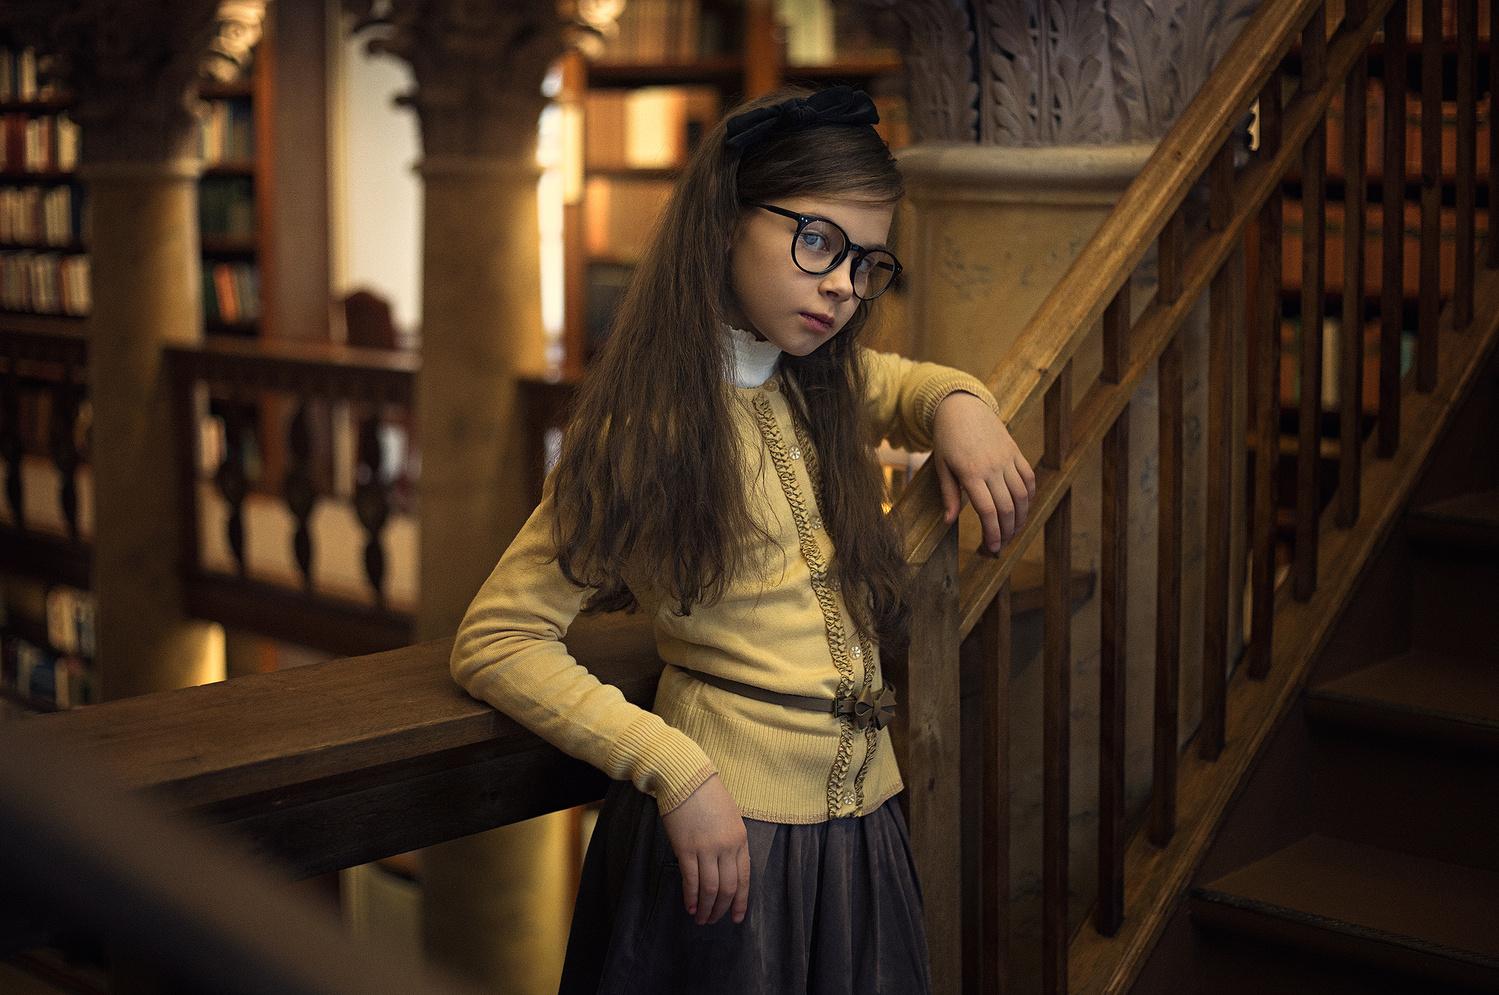 Library girl by Heikki M